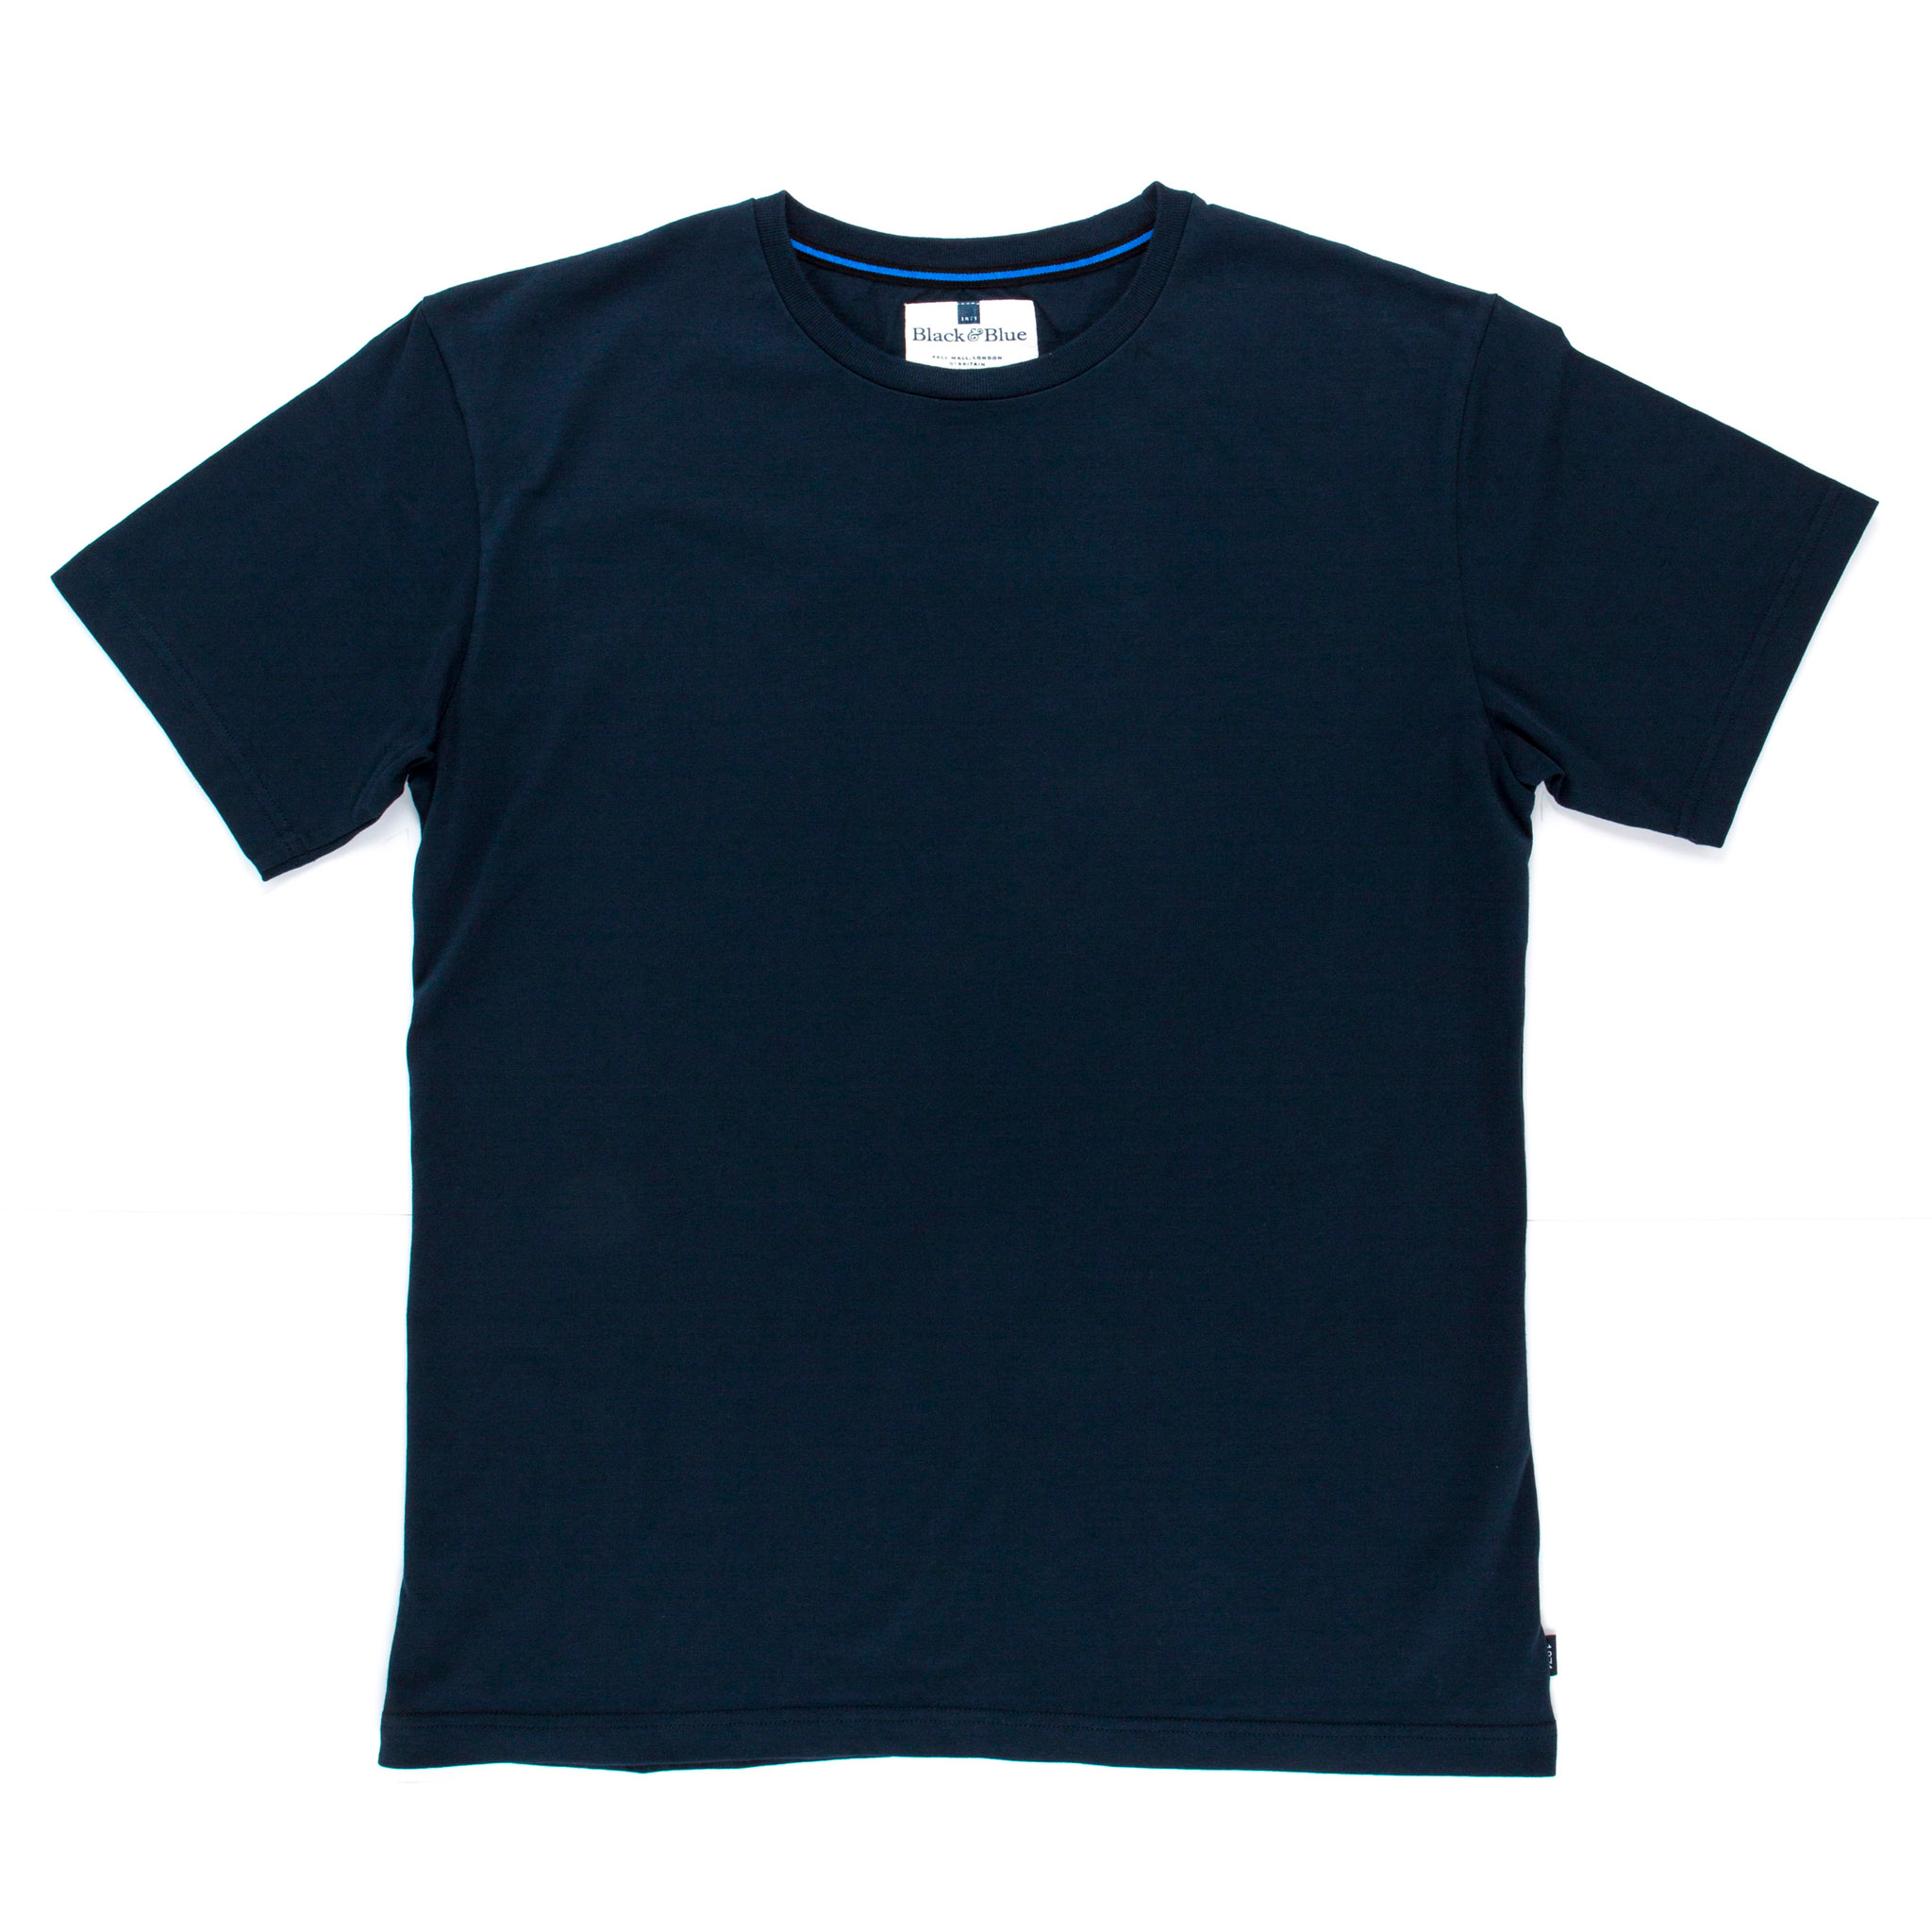 Navy Organic cotton T-shirt